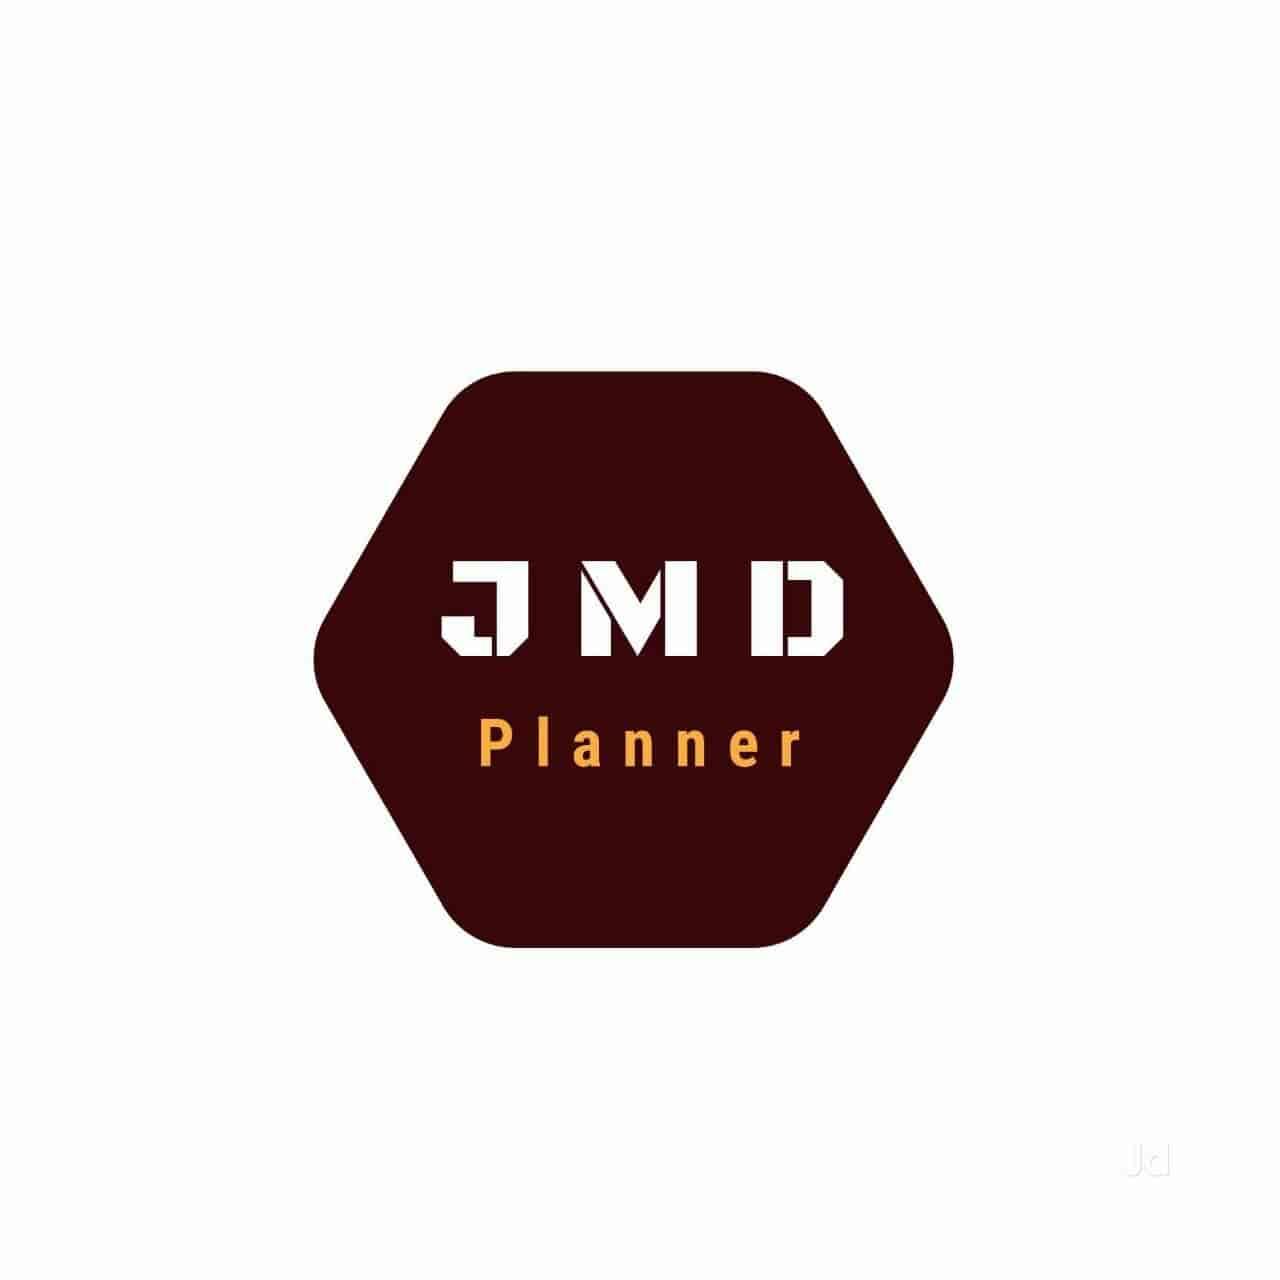 Bad Planner jmd planner bad event organisers in mathura justdial